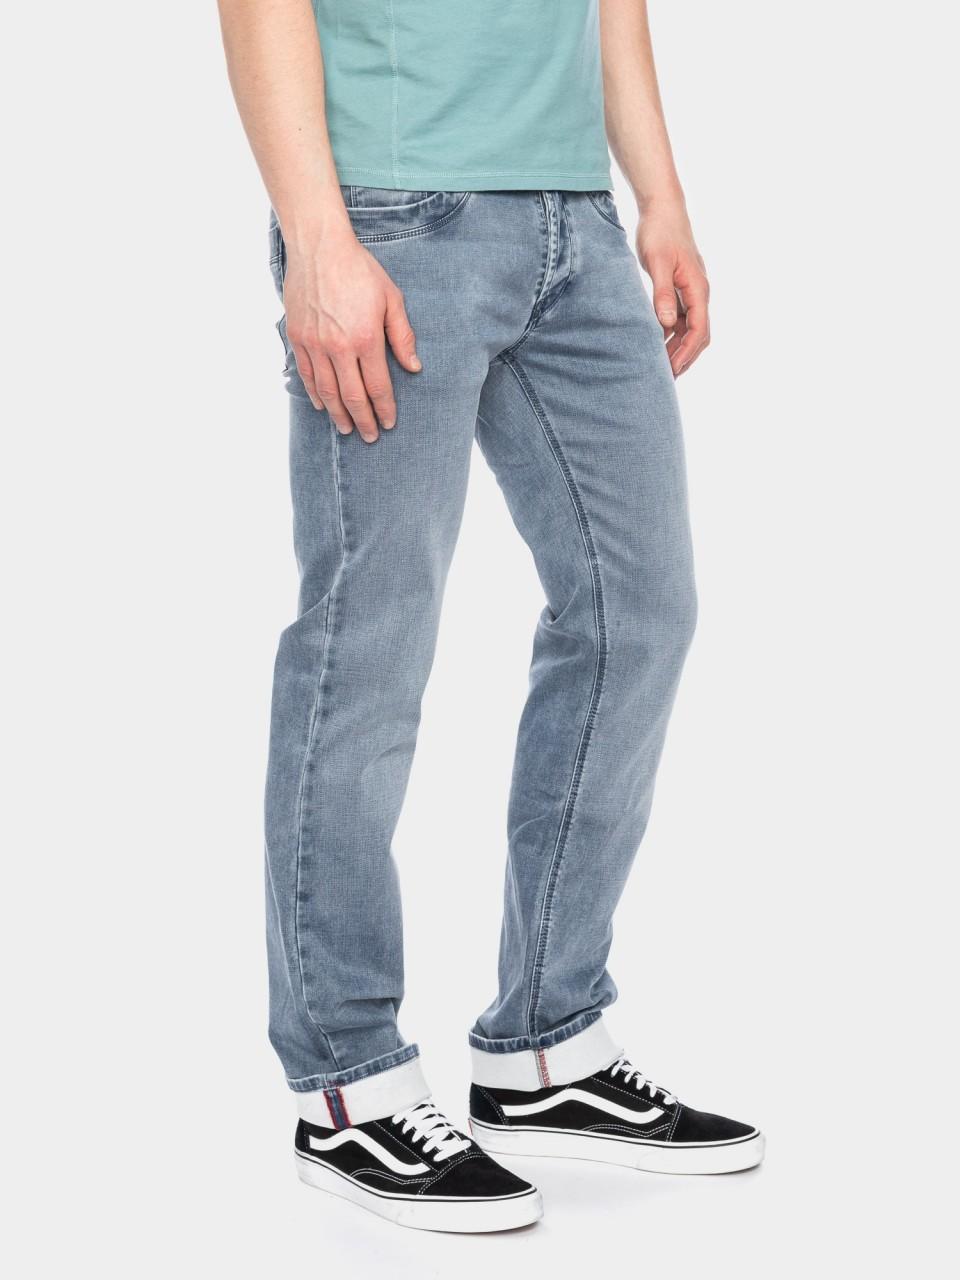 Jeans Egon Celio Blue HBL USD